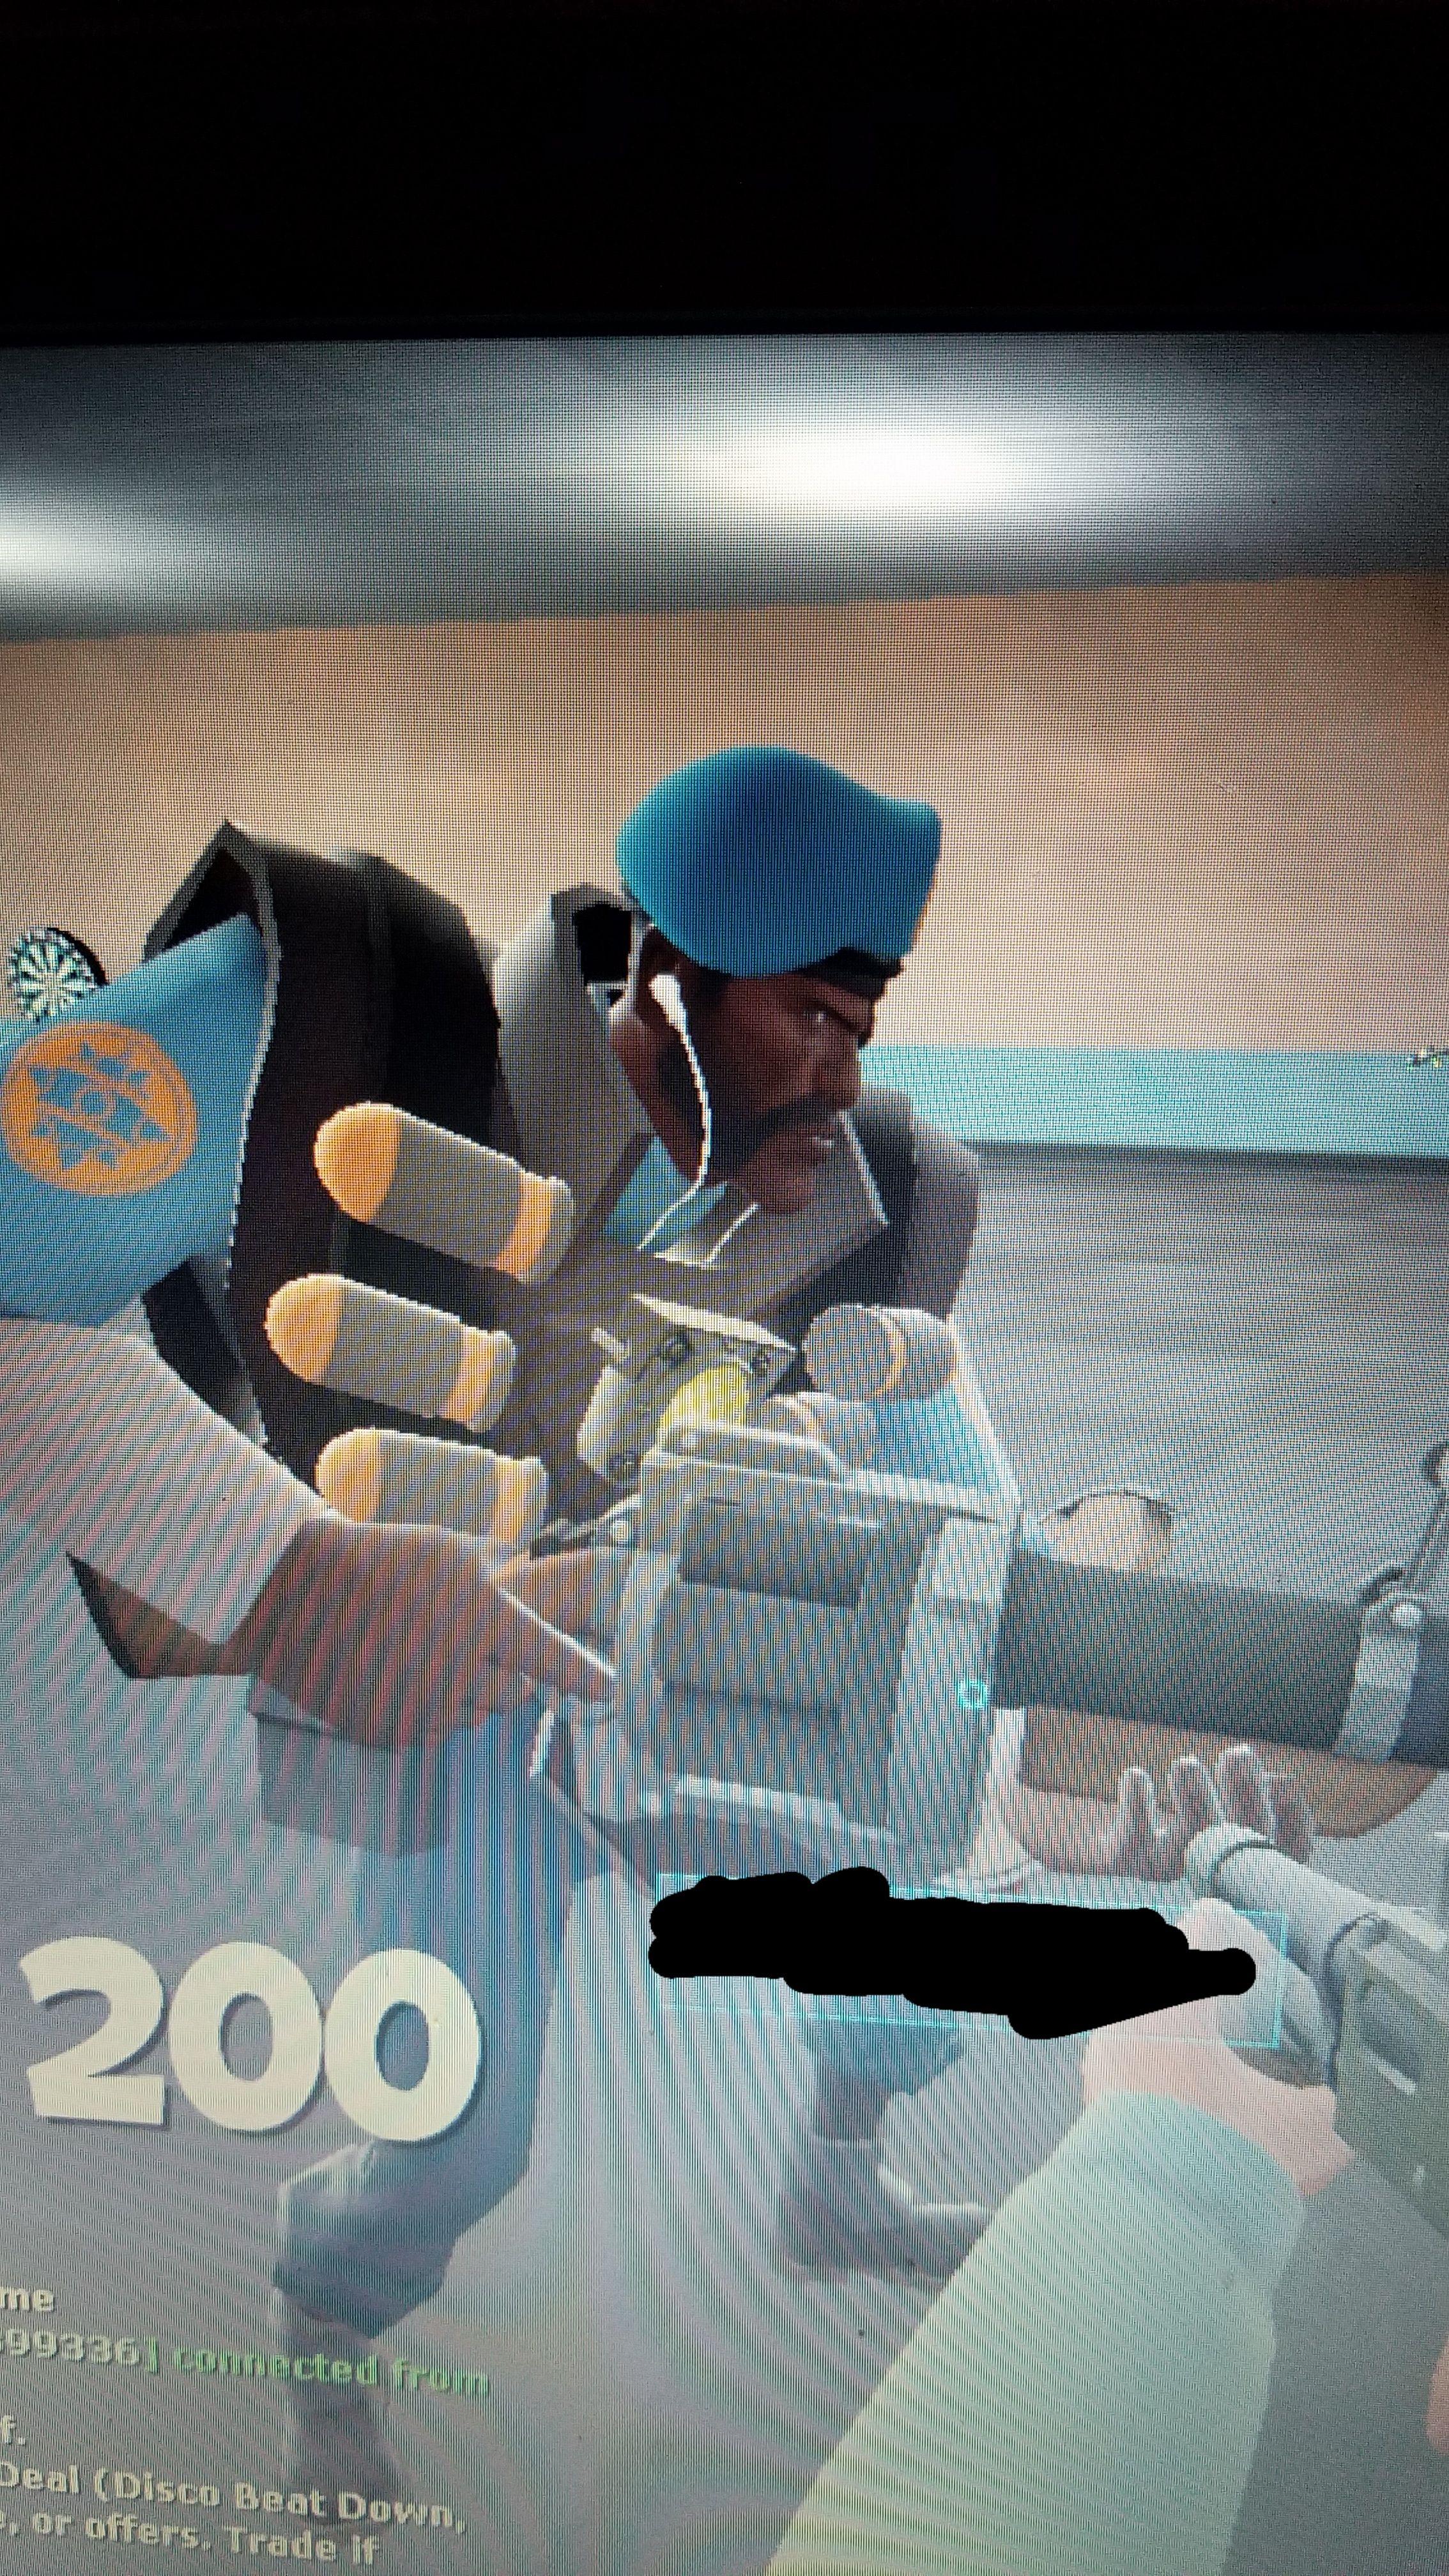 This Guy Has Stock Grenade Launcher Achievement Chargin Targe